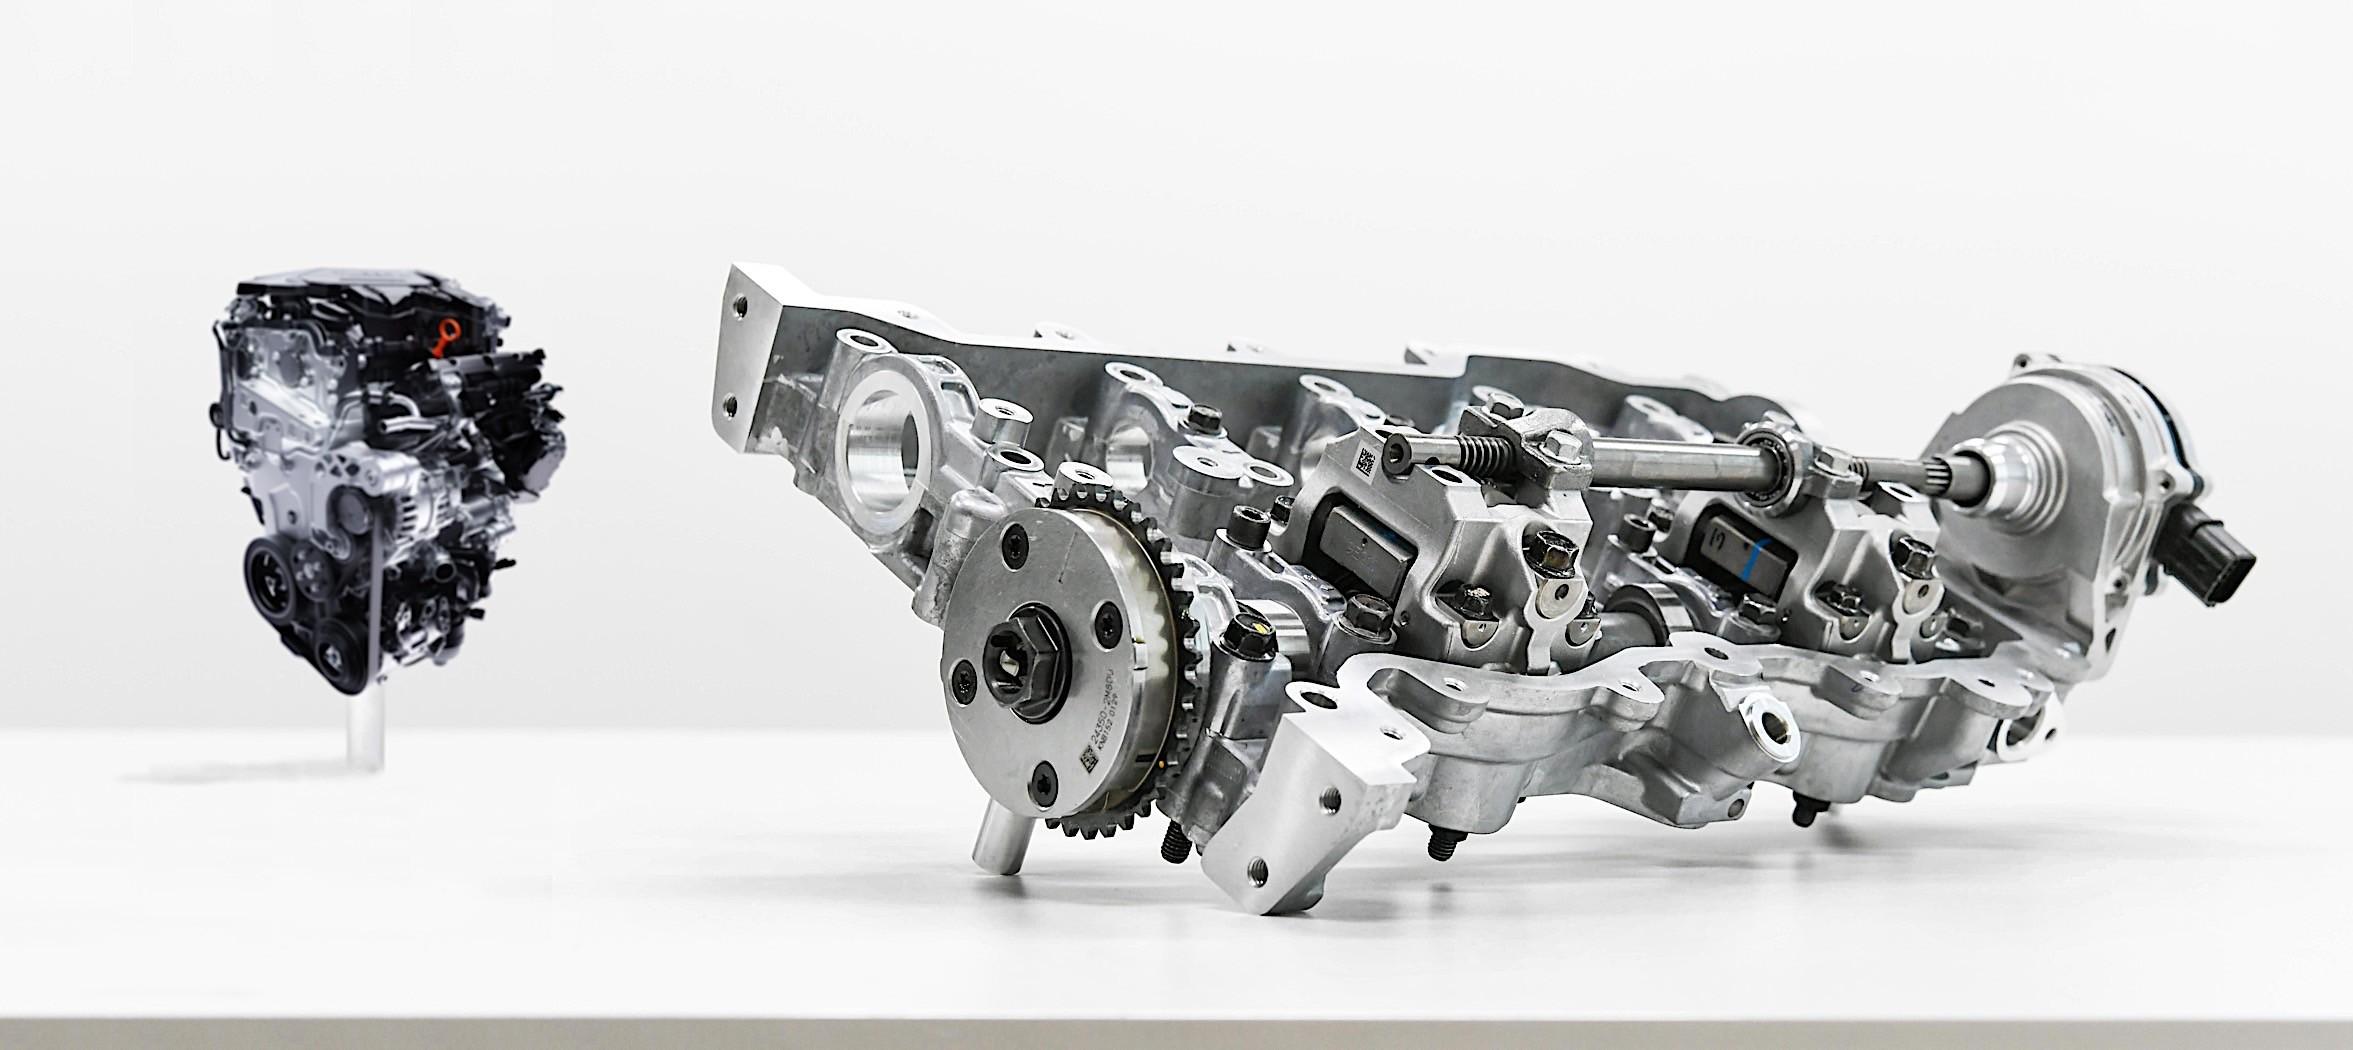 new-smartstream-cvvd-engine-tech-to-power-hyundai-and-kia-cars_1.jpg